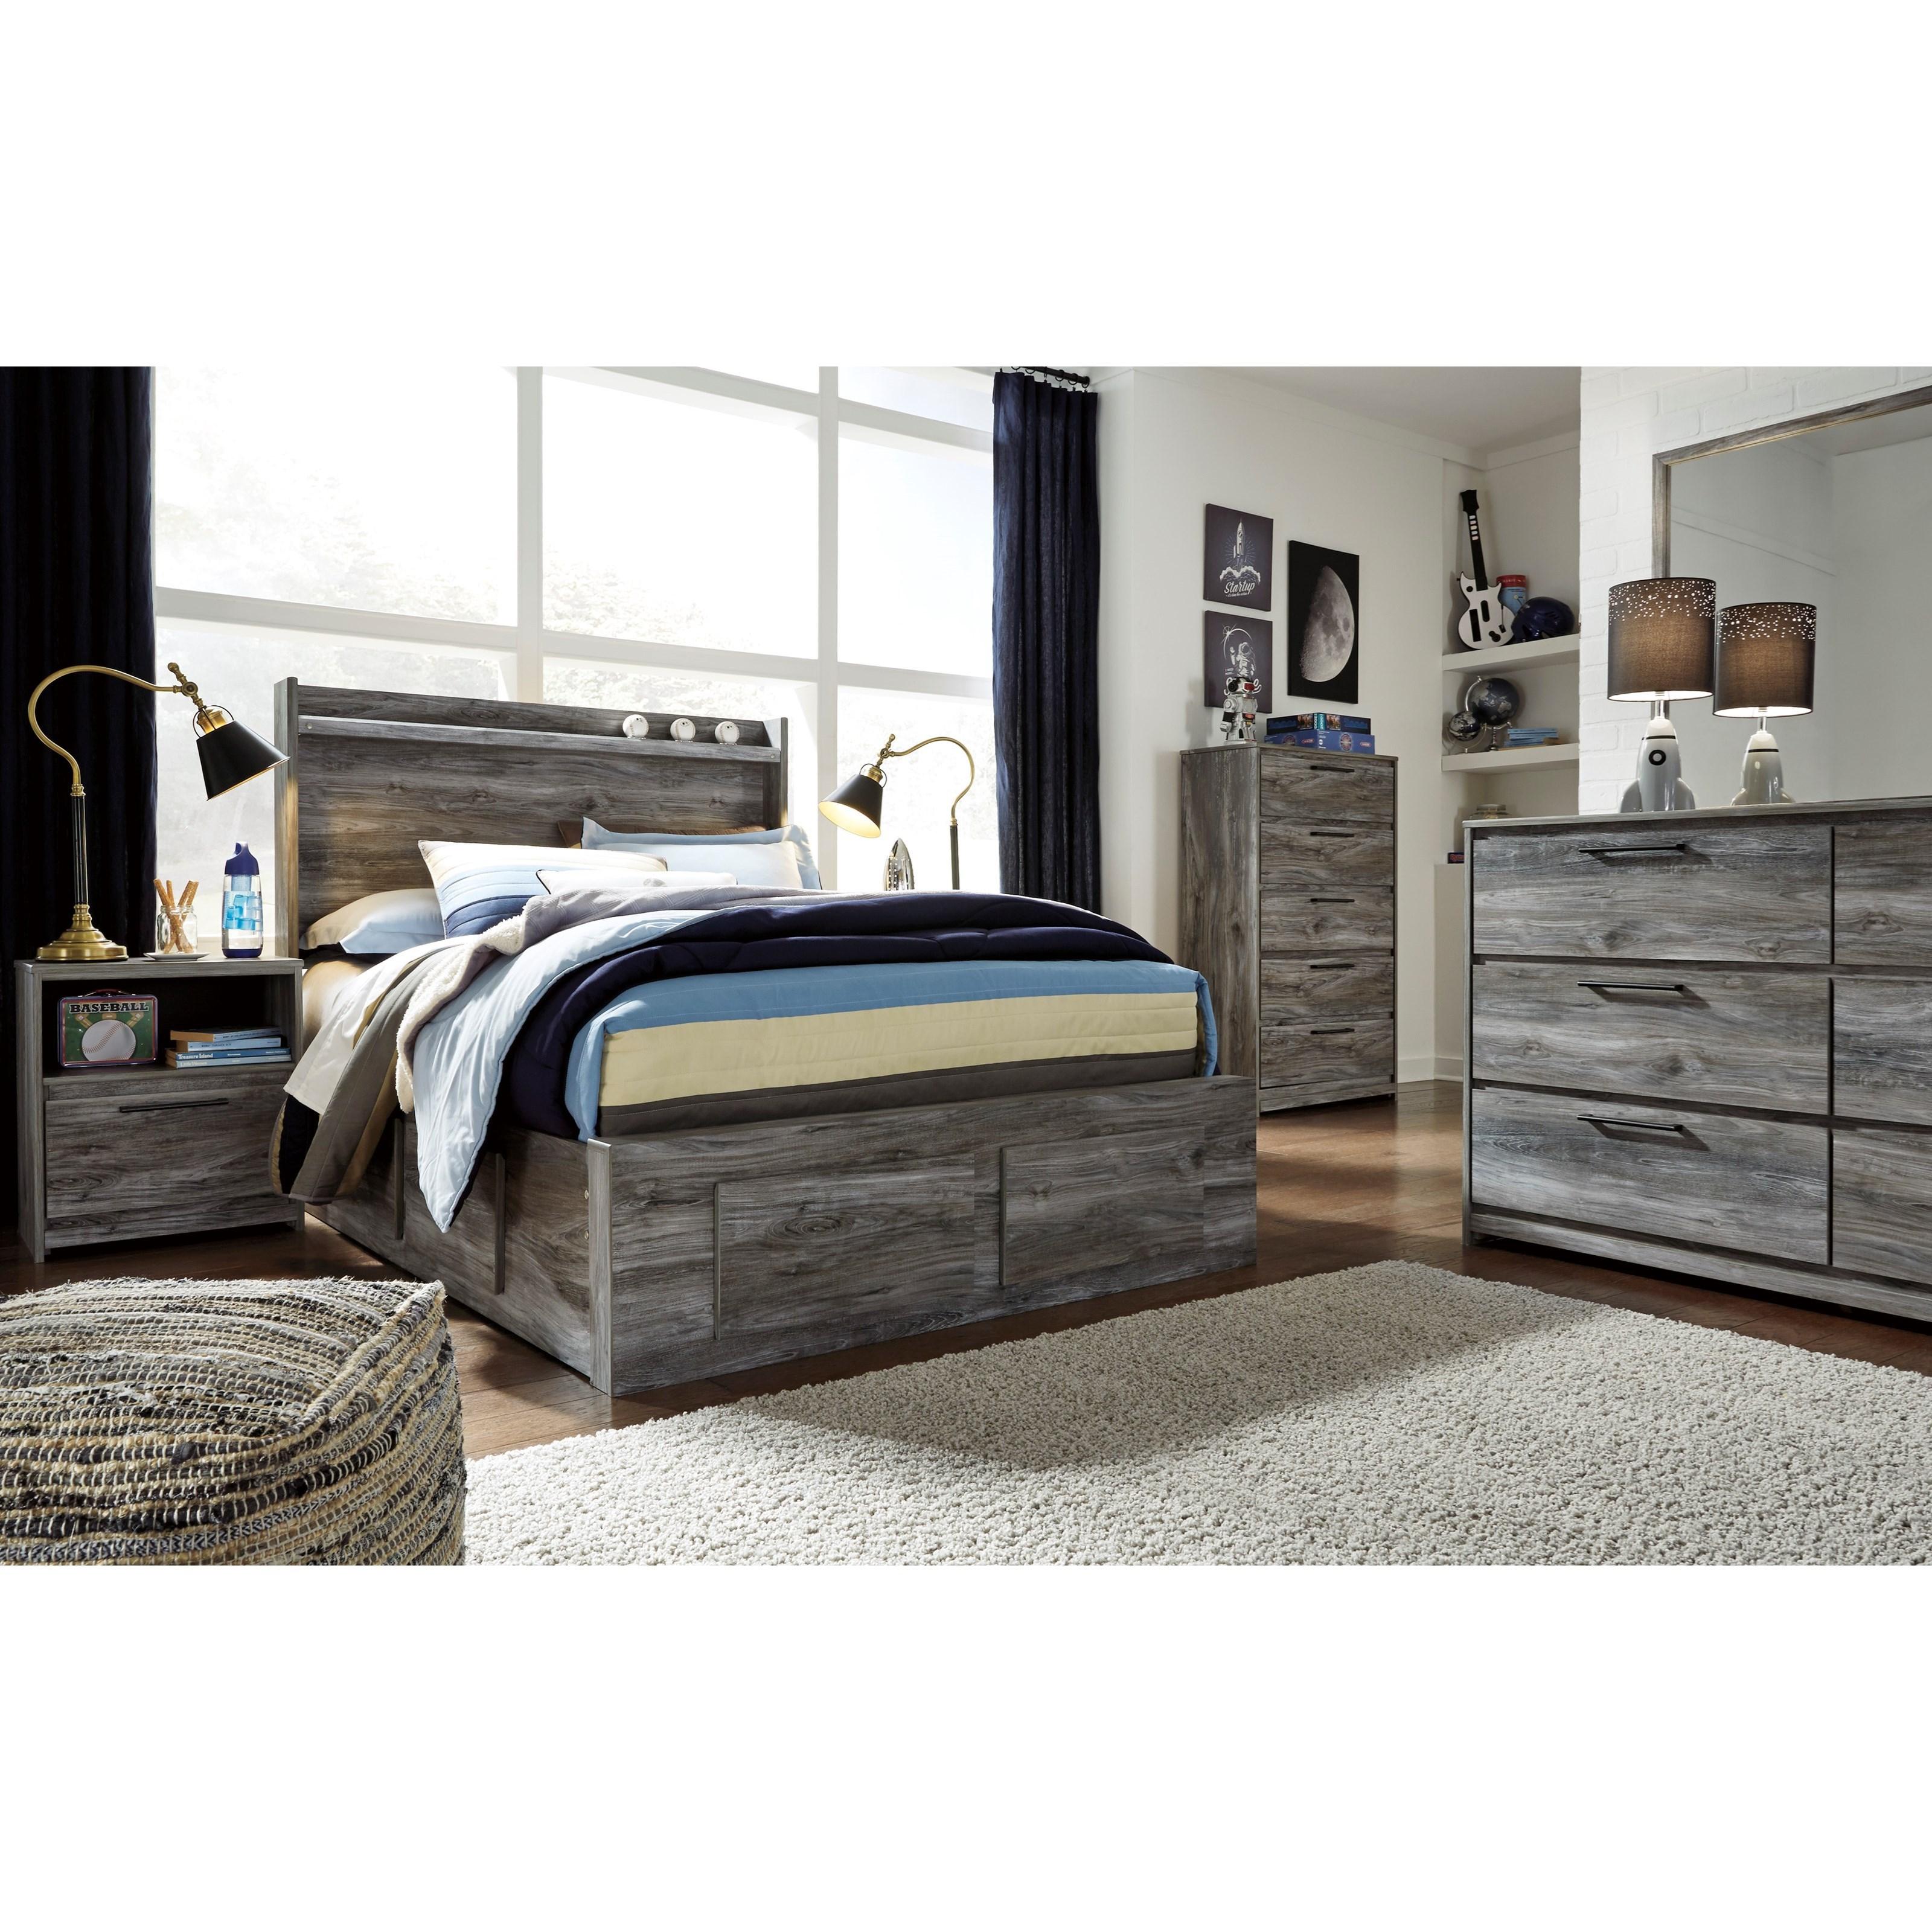 Baystorm Full Size Storage Bed B221: Ashley Signature Design Baystorm B221-84S+87+2x50+B100-12